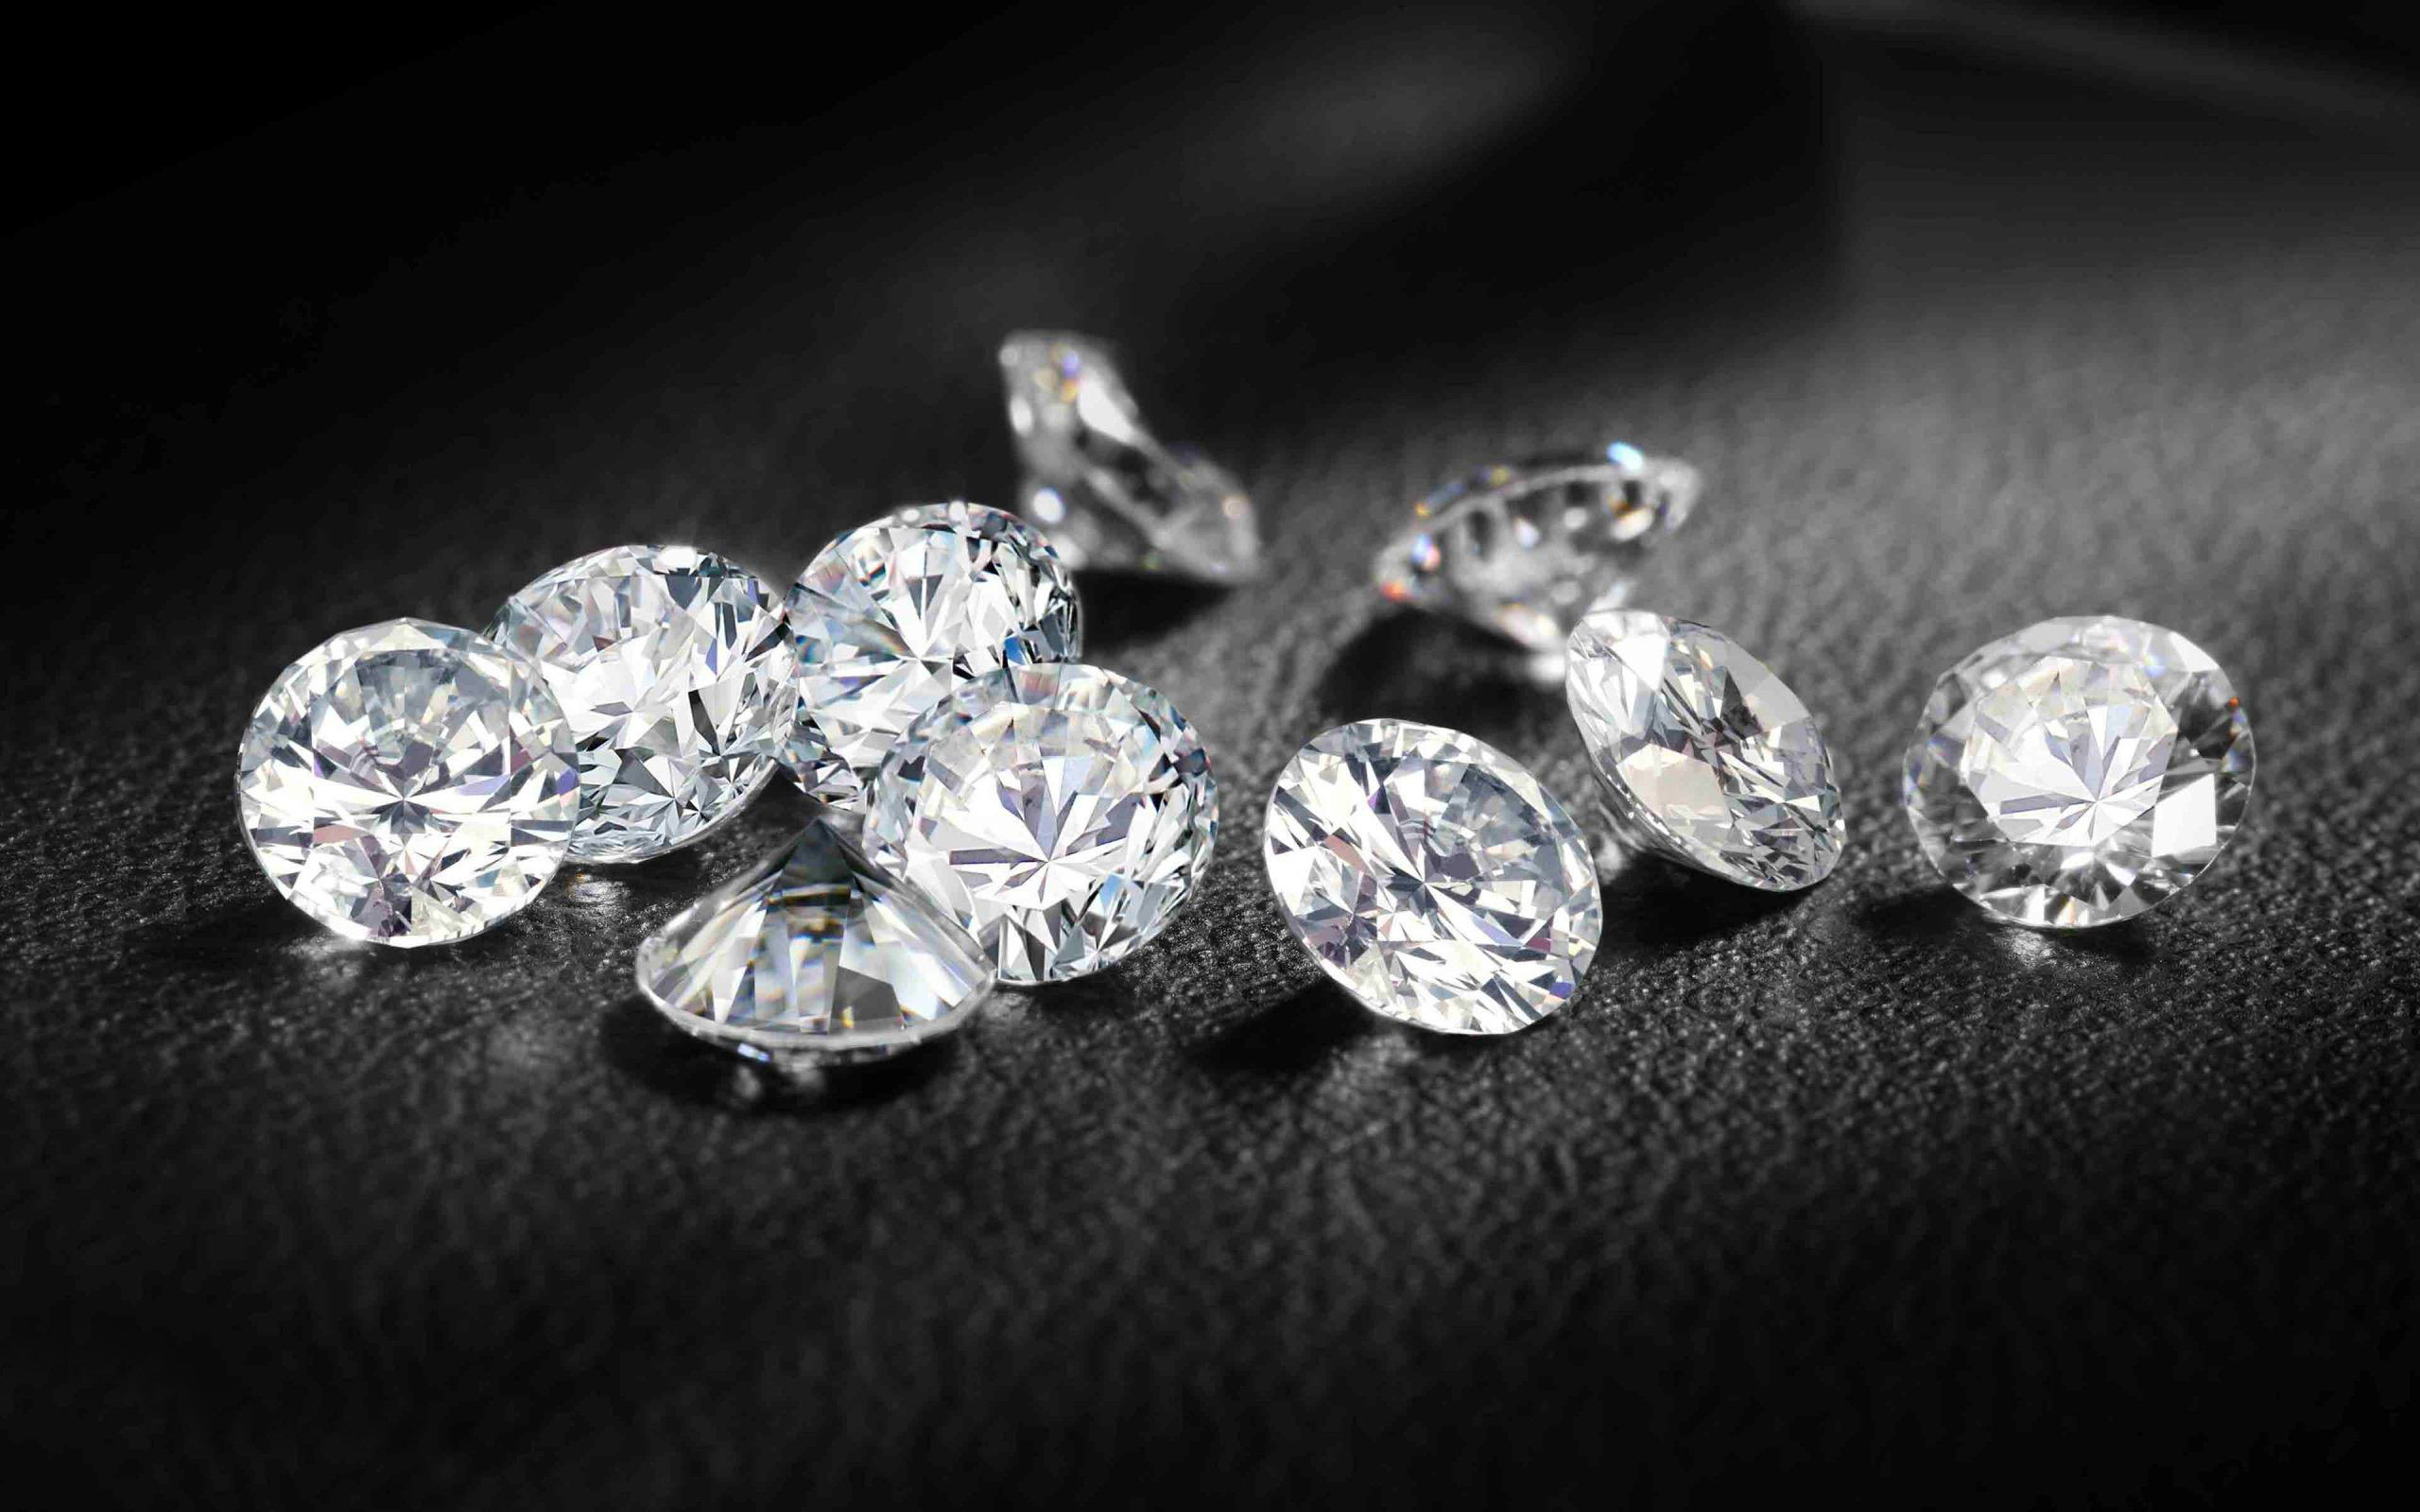 Diamonds Wallpaper 6086 2560x1600